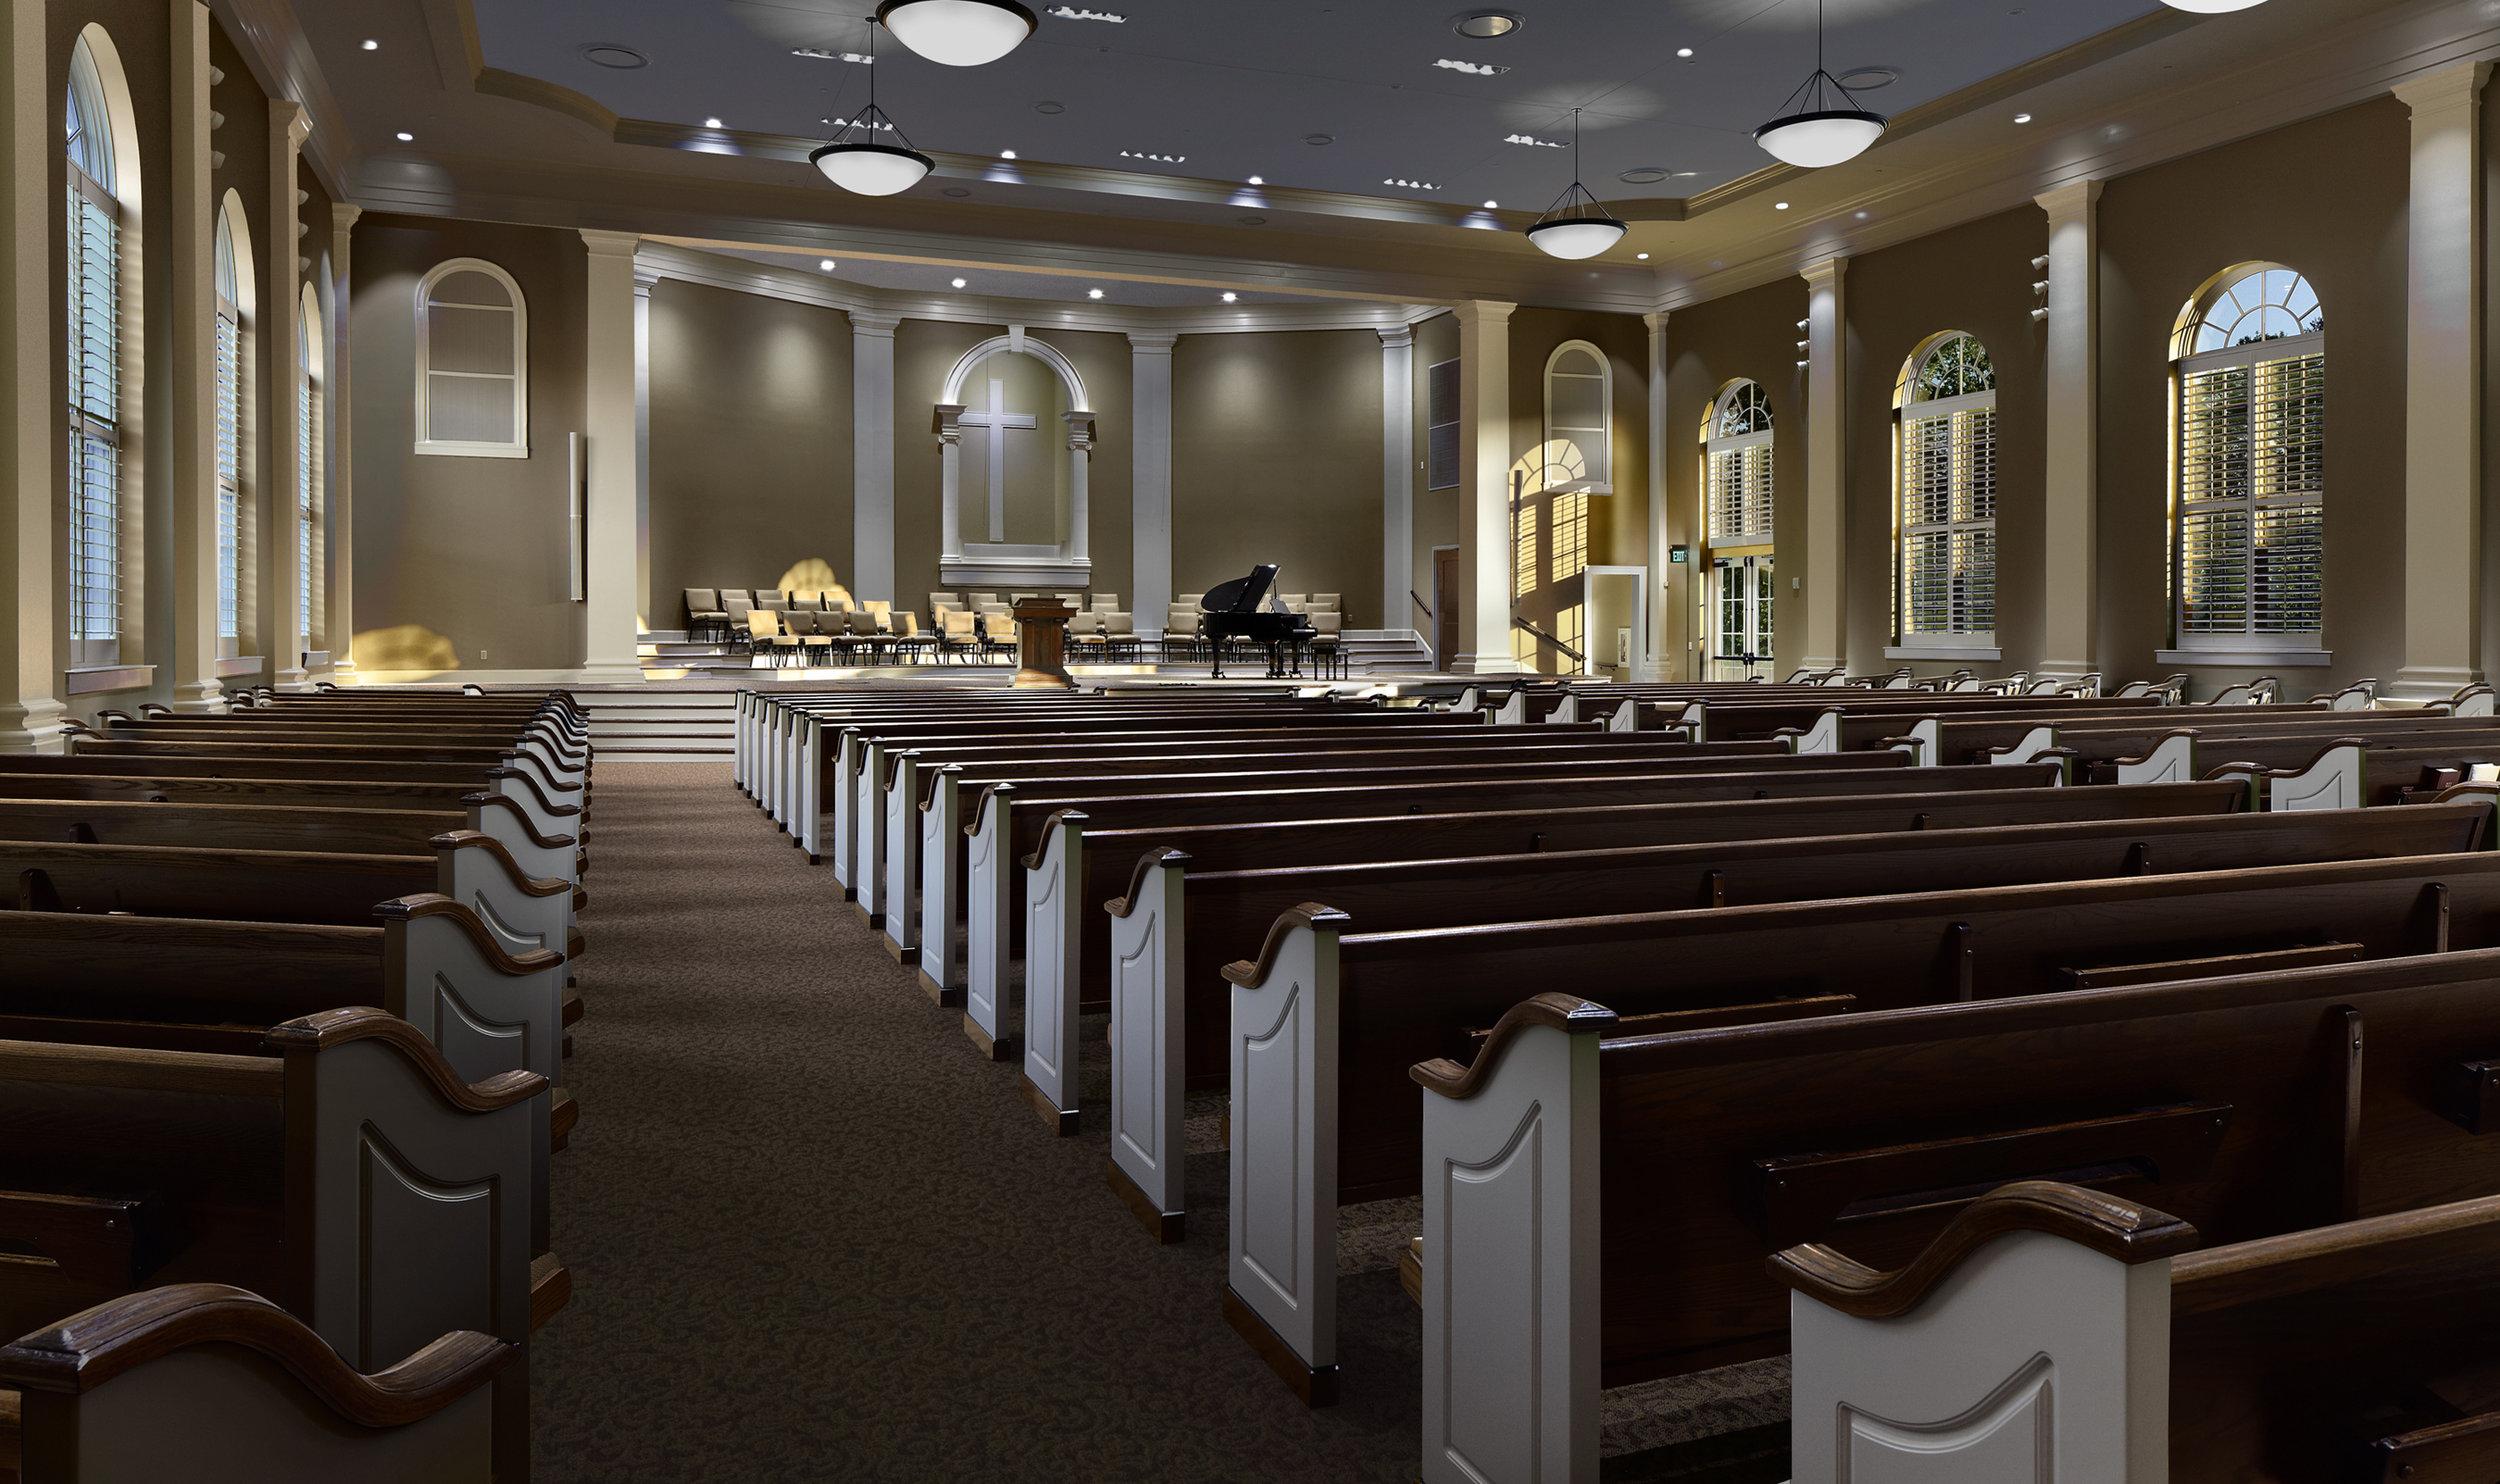 01_Hord Architects_Crossroads Baptist_Interior - 9 in wide, 300 dpi.jpg